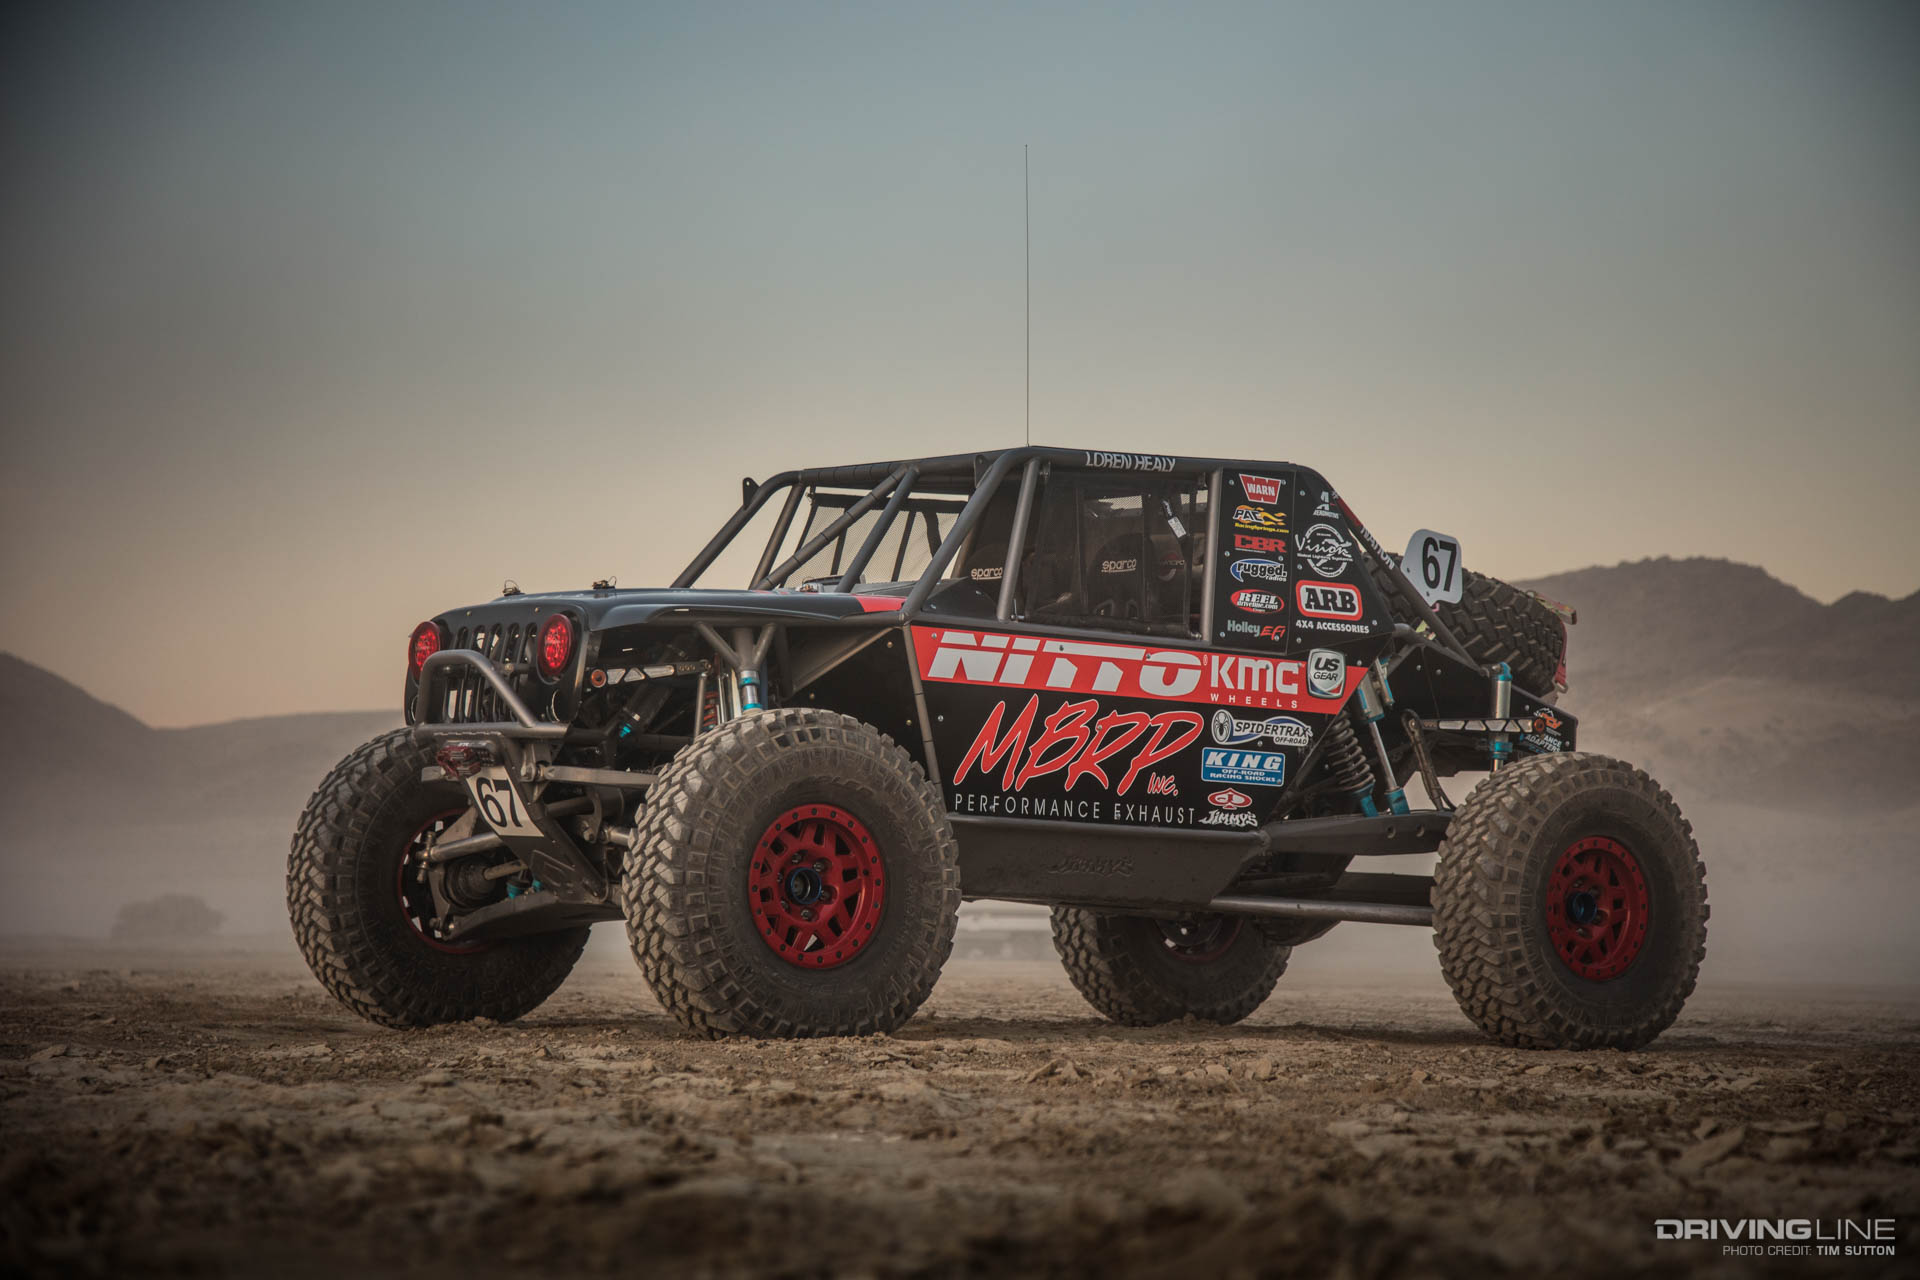 Build A Jeep >> Red Dragon 2.0: Loren Healy's Latest 4400 Masterpiece | DrivingLine